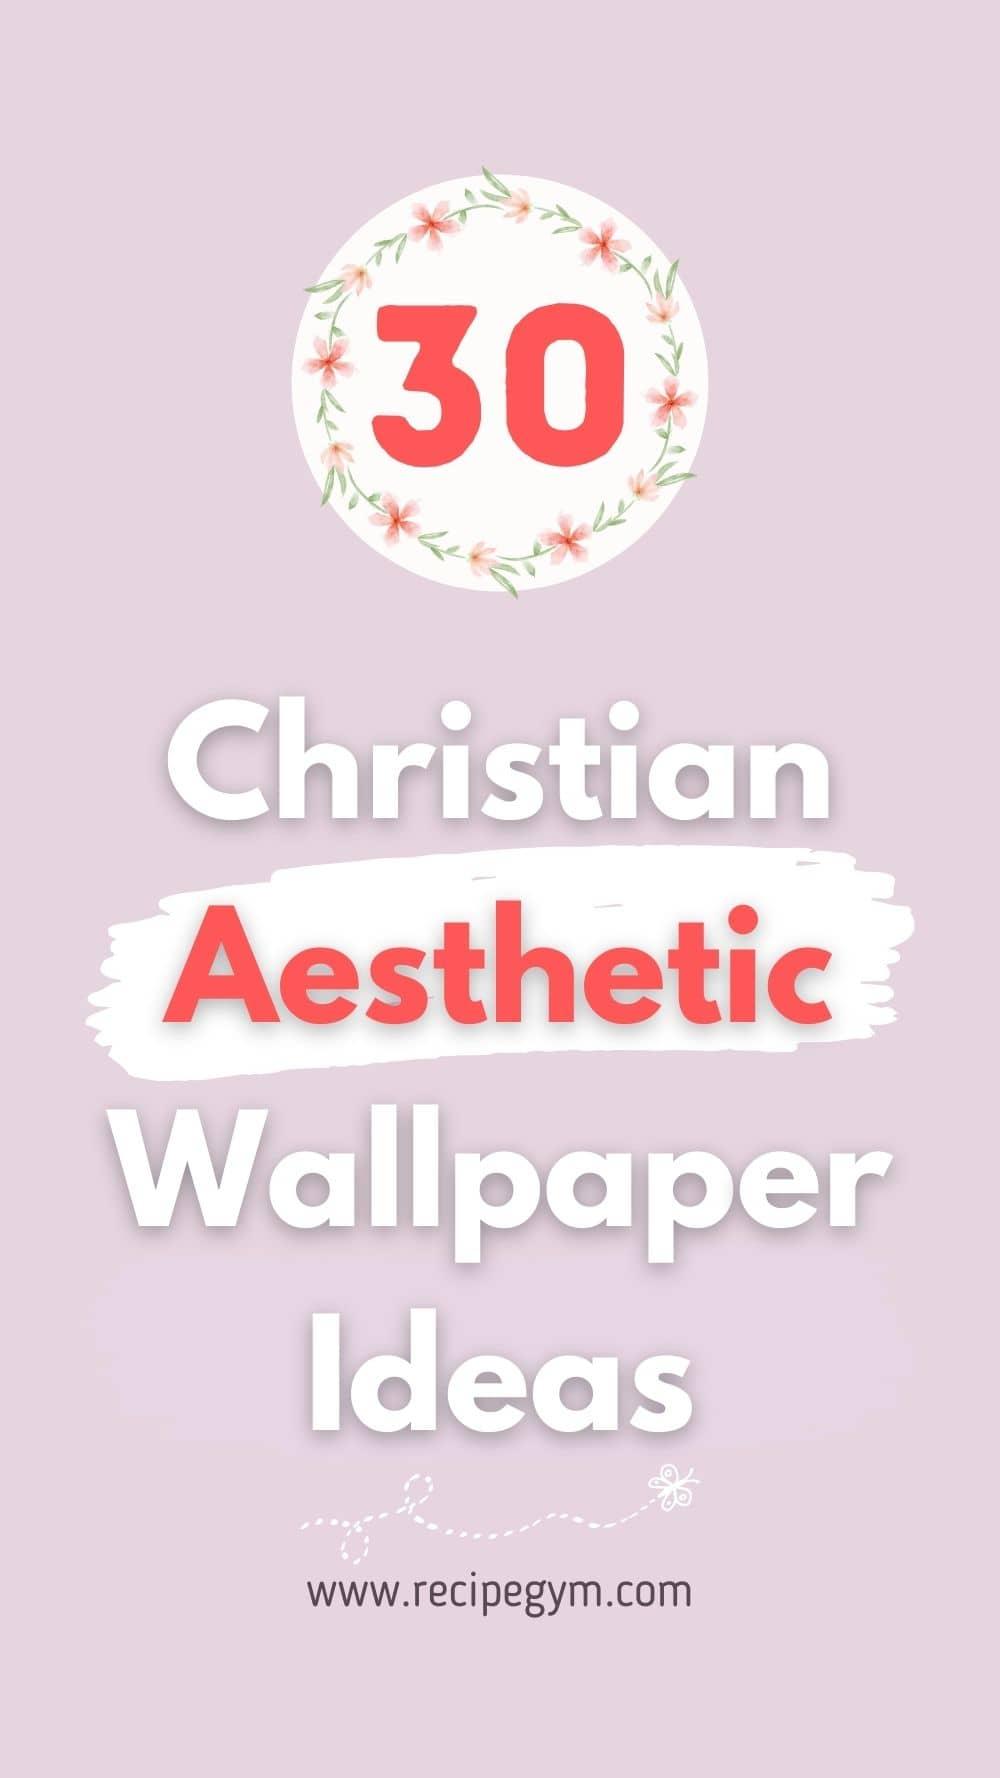 Christian Aesthetic Wallpaper Ideas